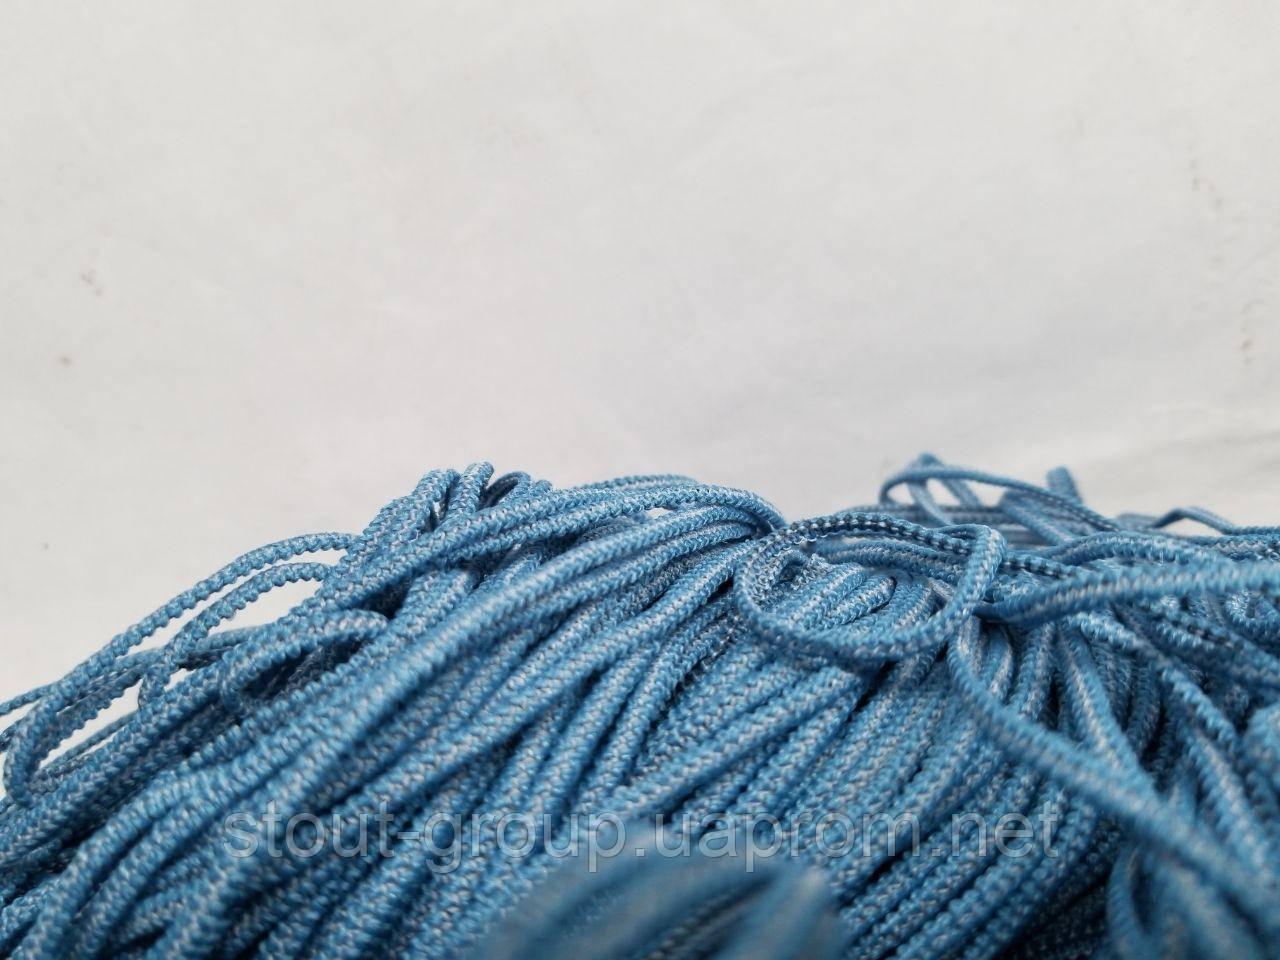 Резинка бельевая 3 мм (лента, тесьма эластичная)